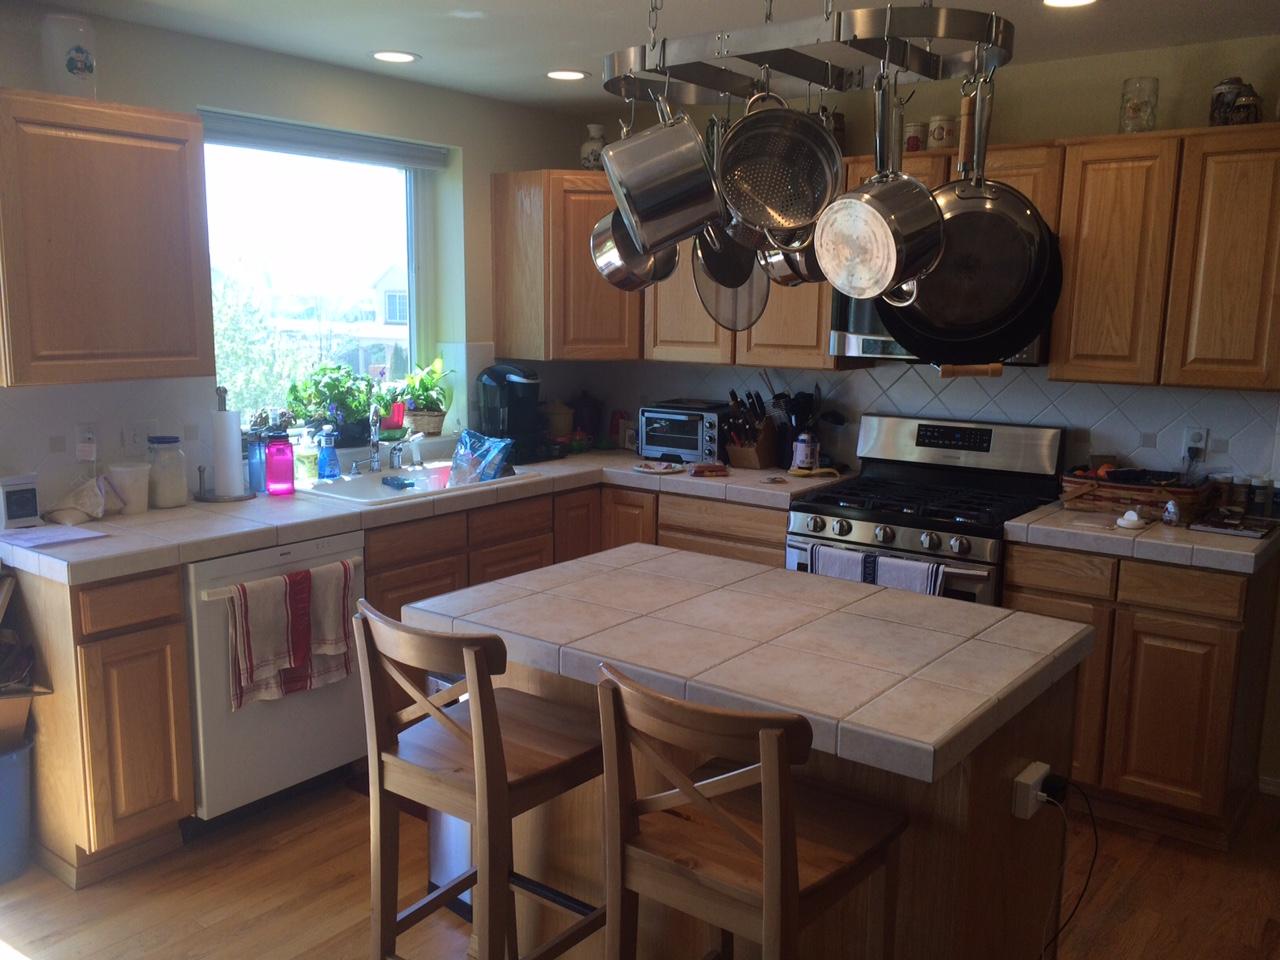 Kitchen – Ground Control To Major Mom